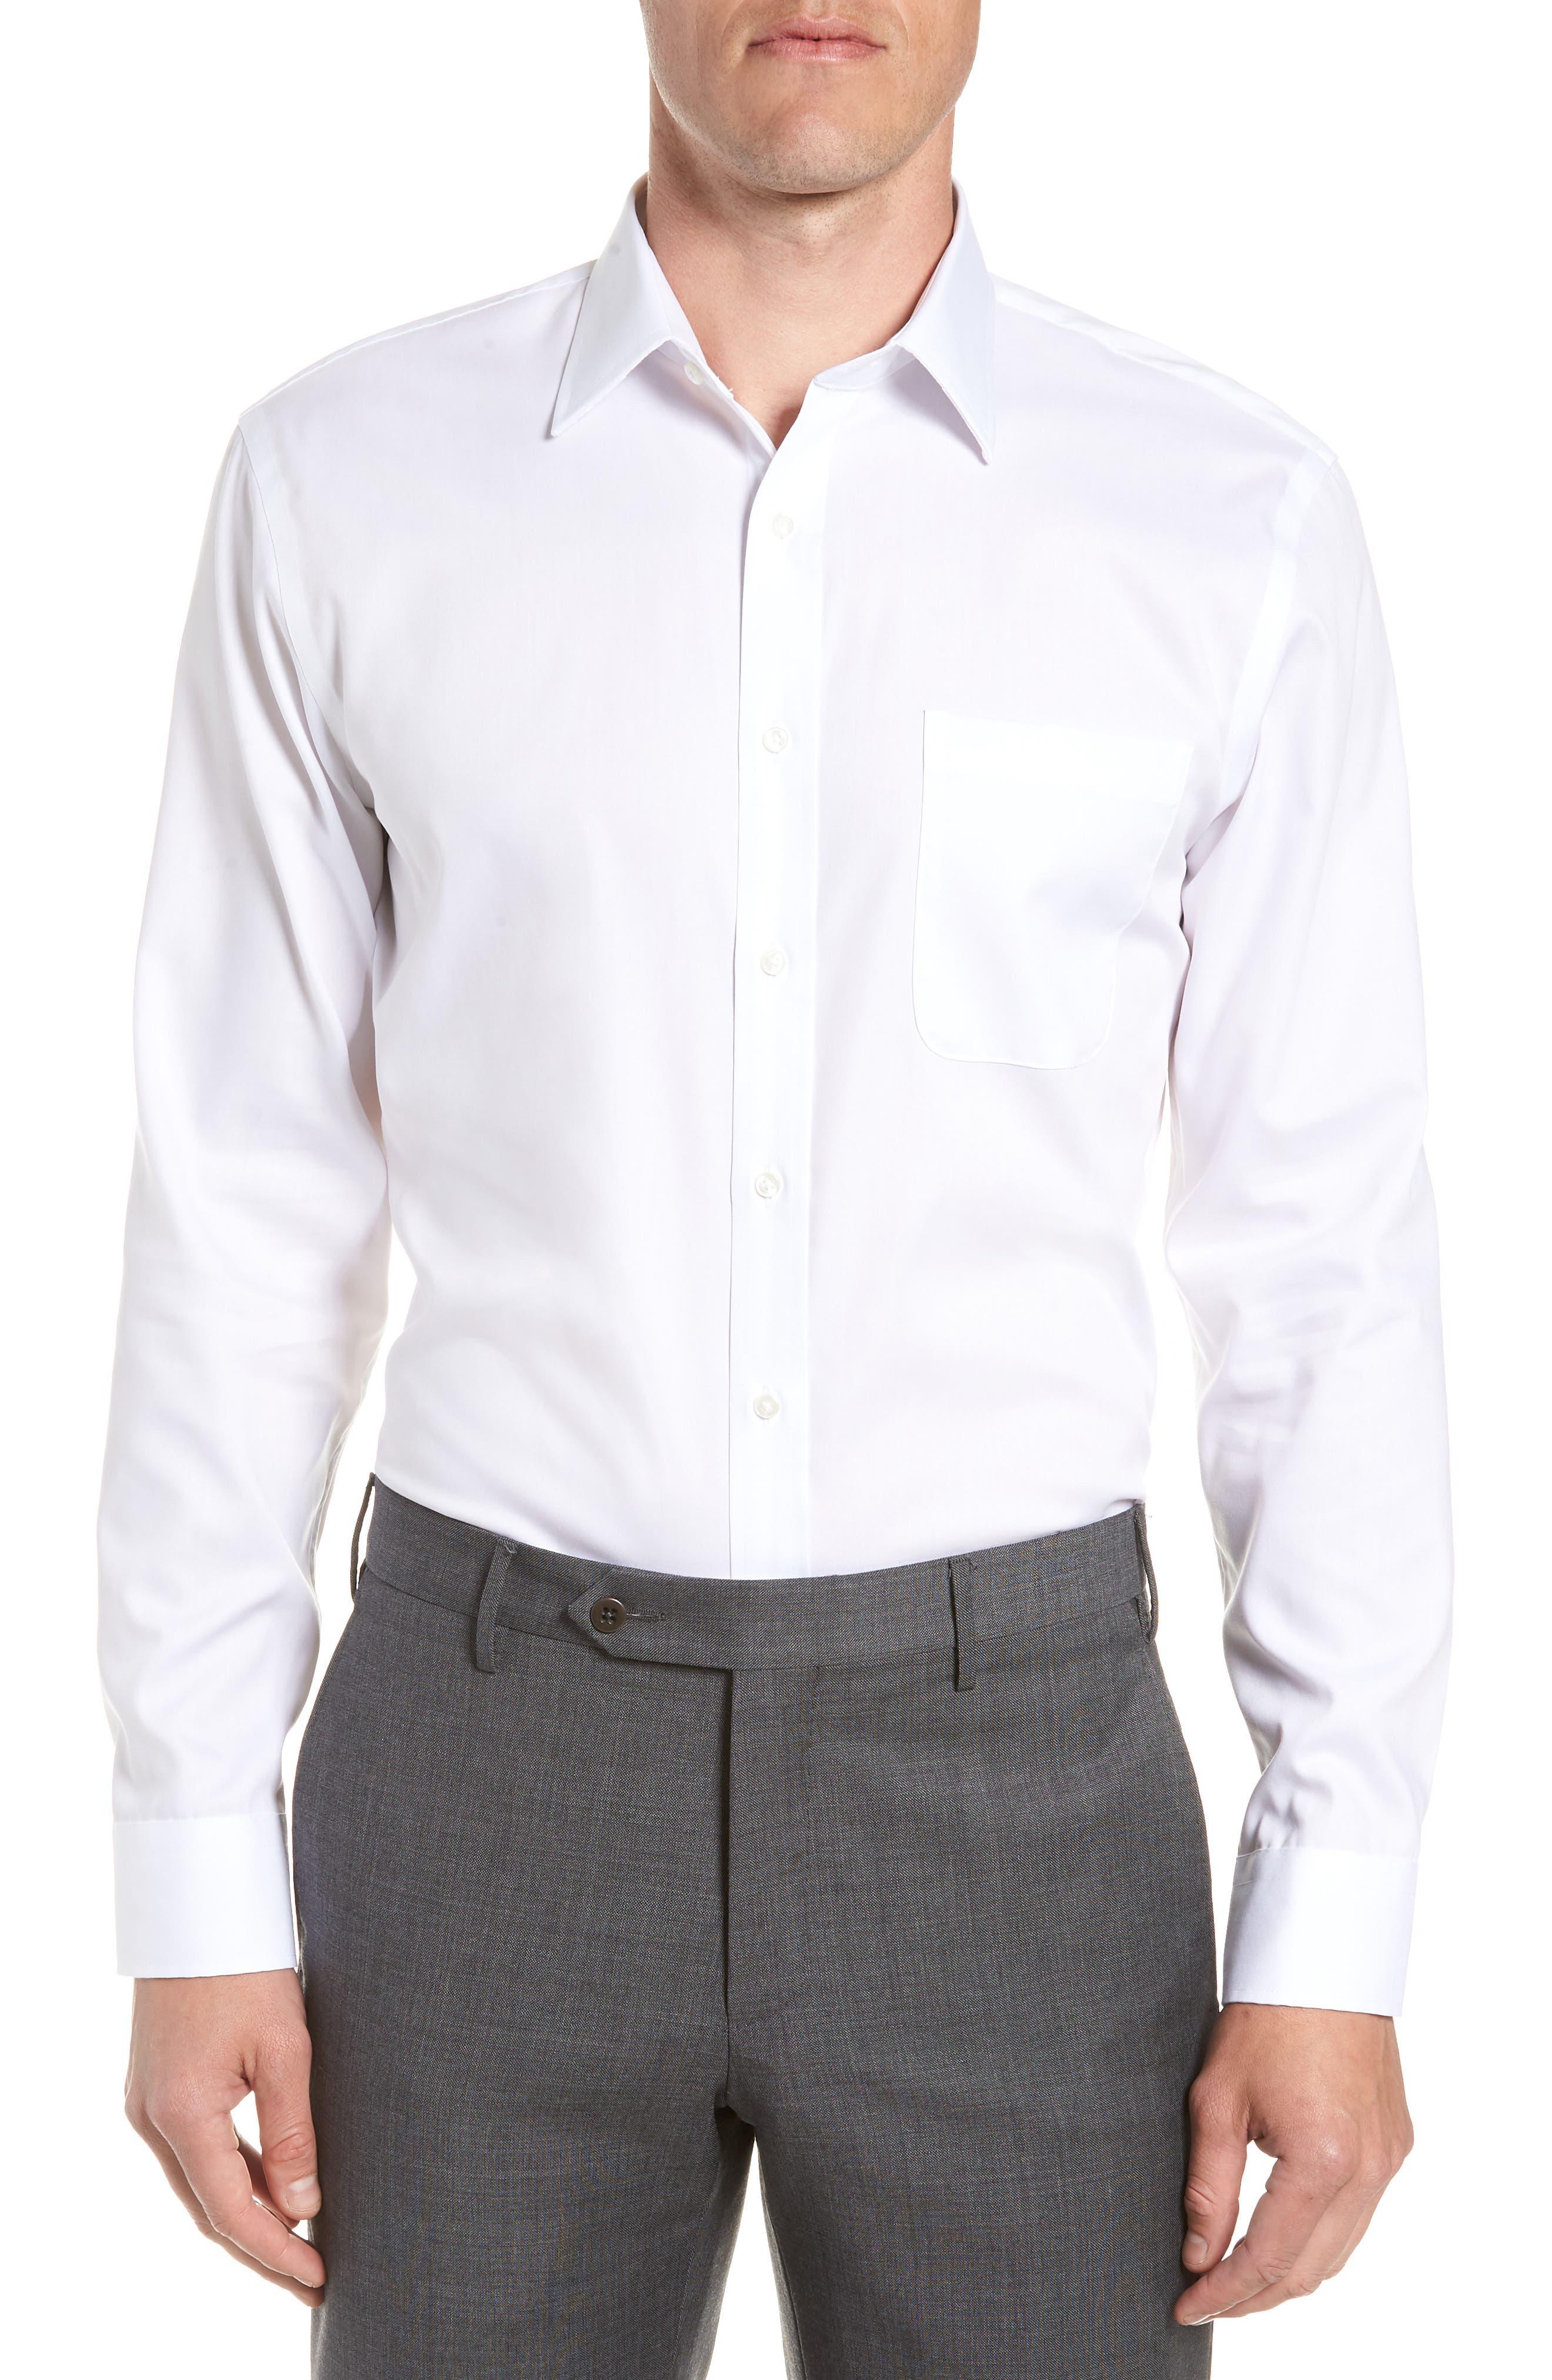 Grey and White Men's Dress Shirts